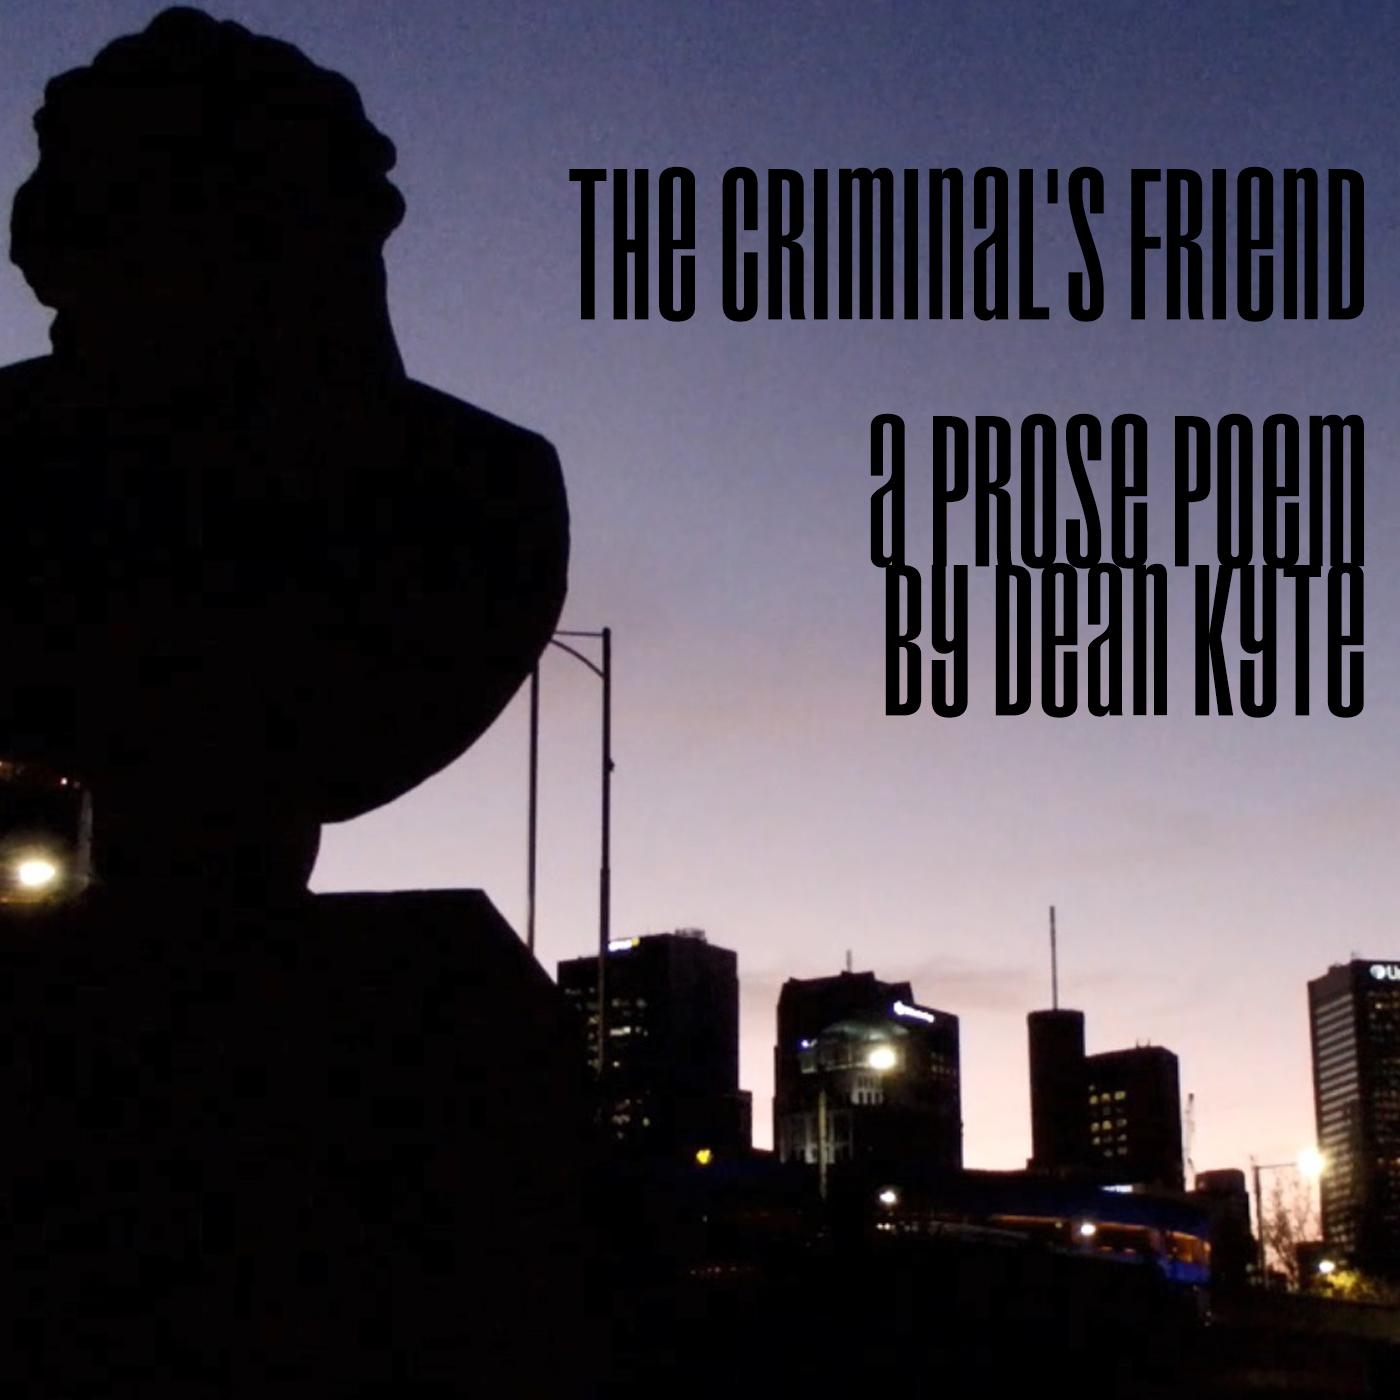 The criminal's friend - A prose poem by Dean Kyte.